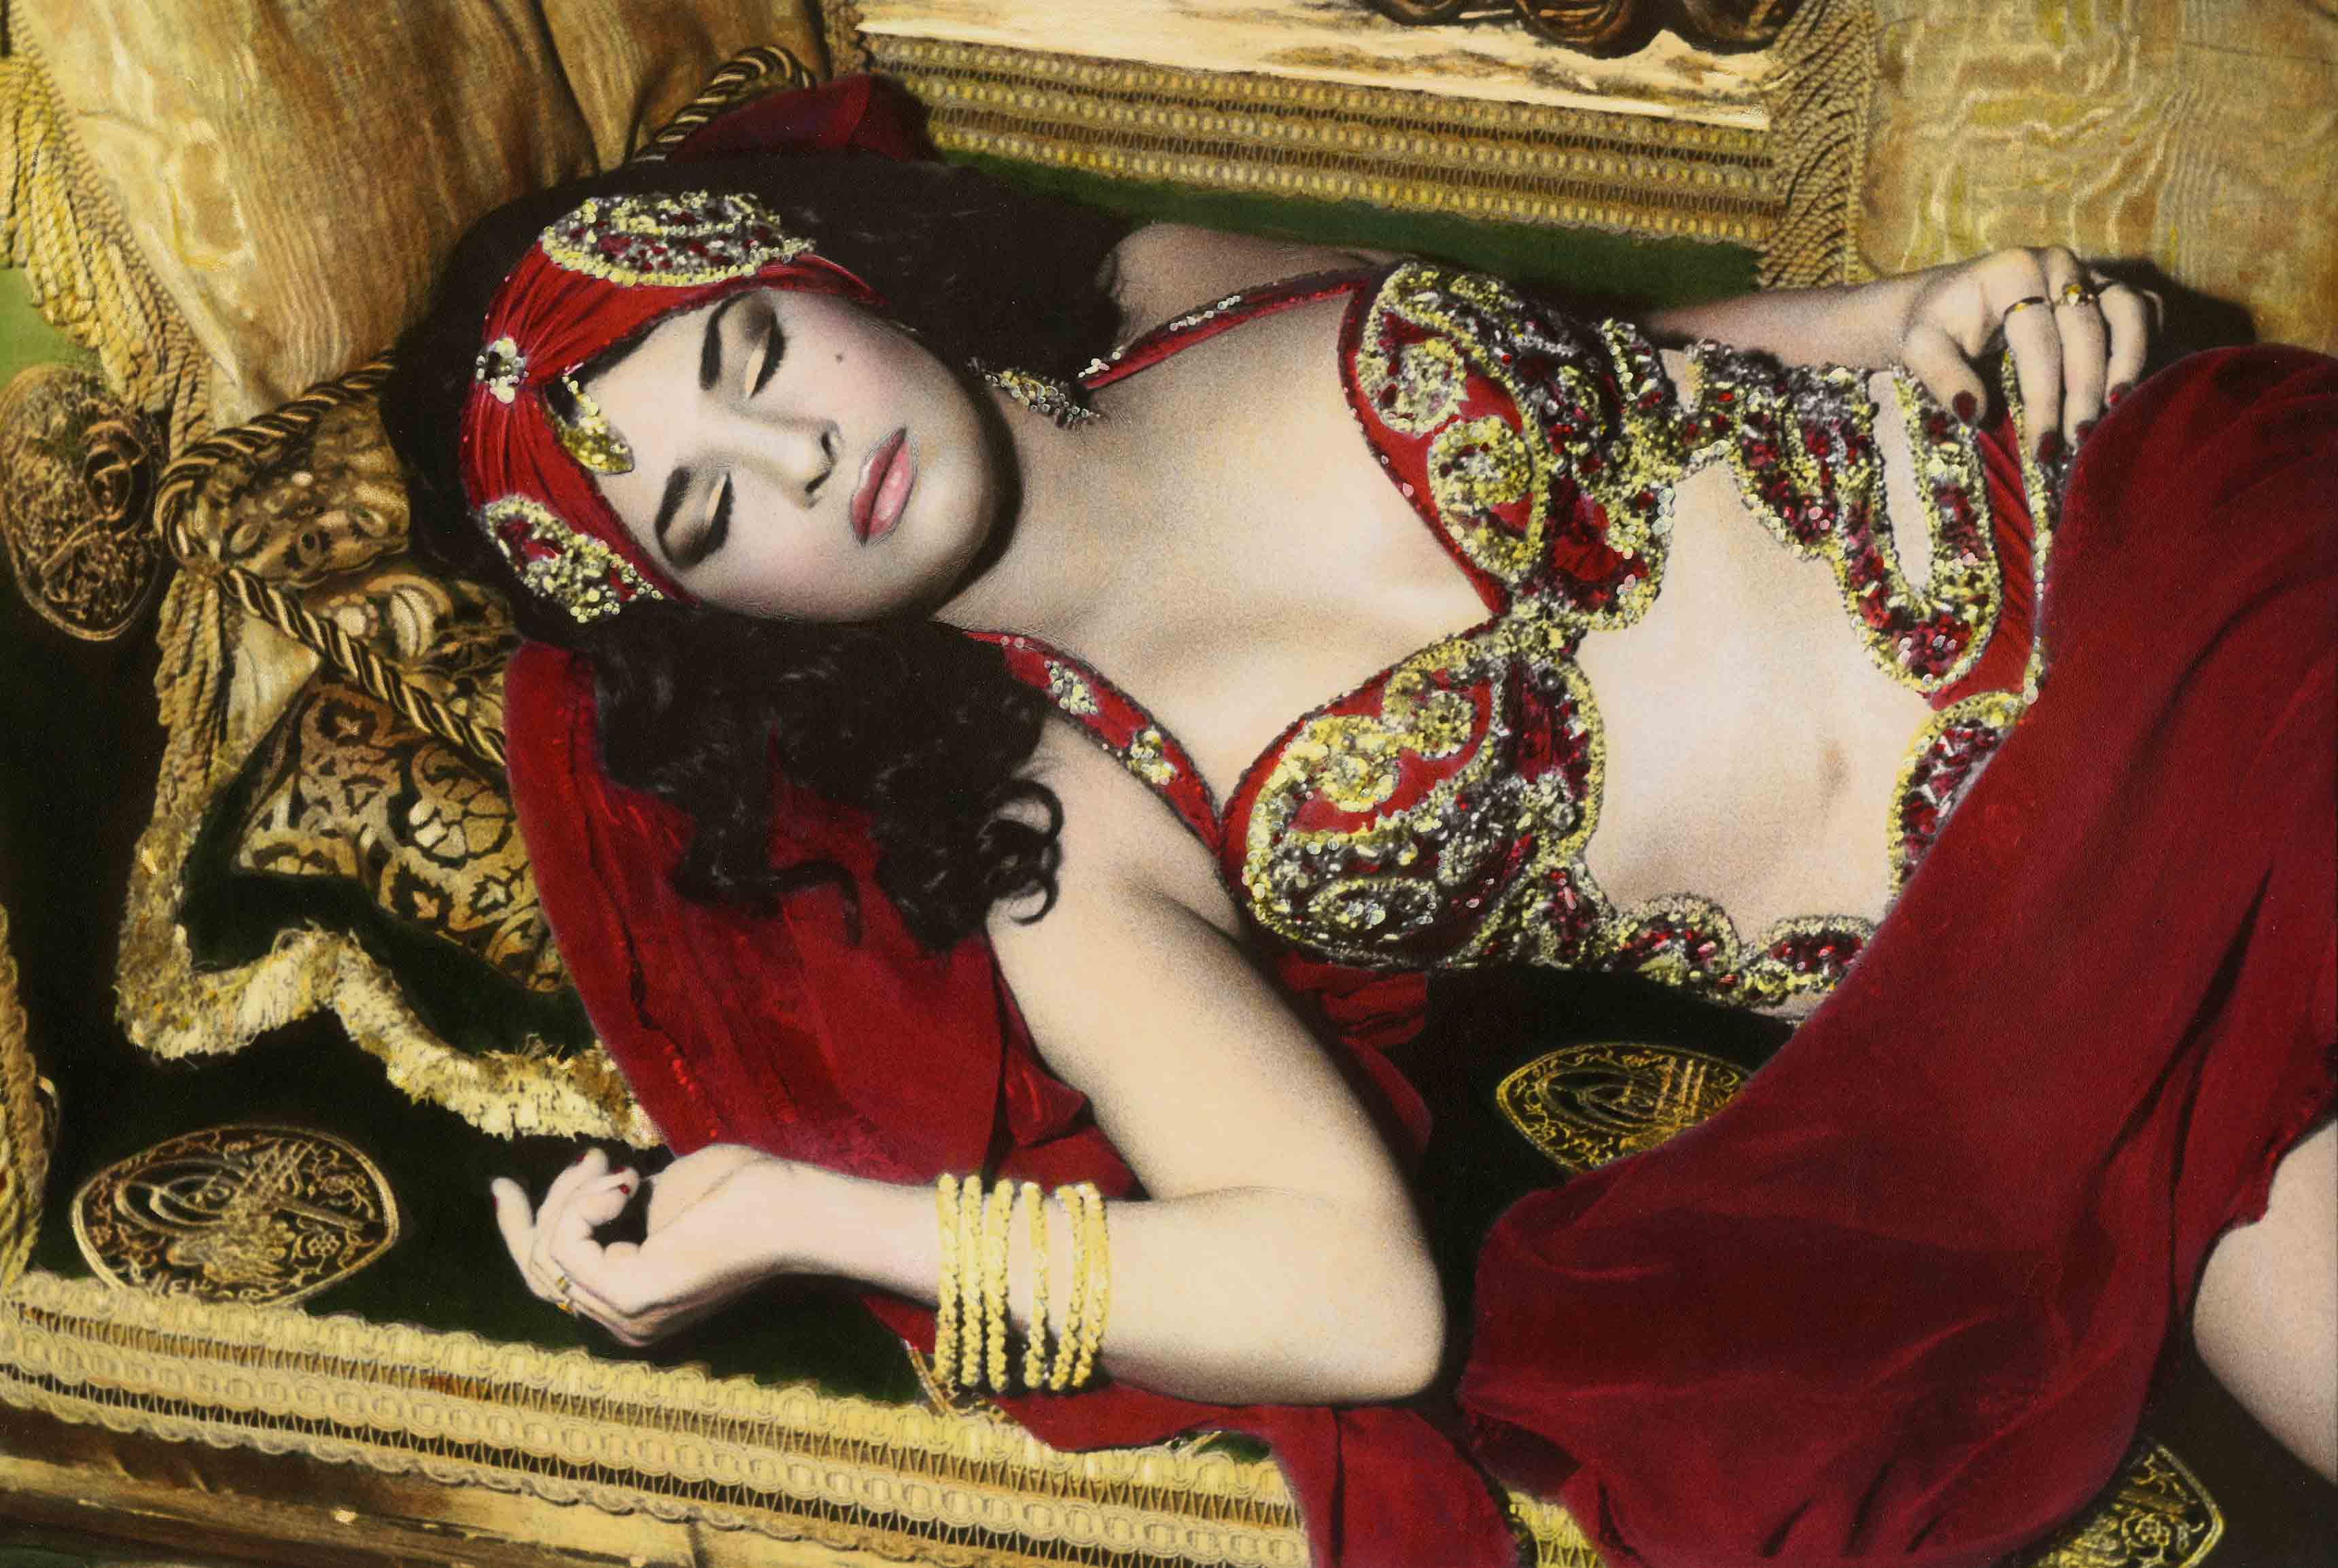 Natacha sleeping, Cairo 2000 © Youssef Nabil – Galerie Nathalie Obadia, Paris-Bruxelles